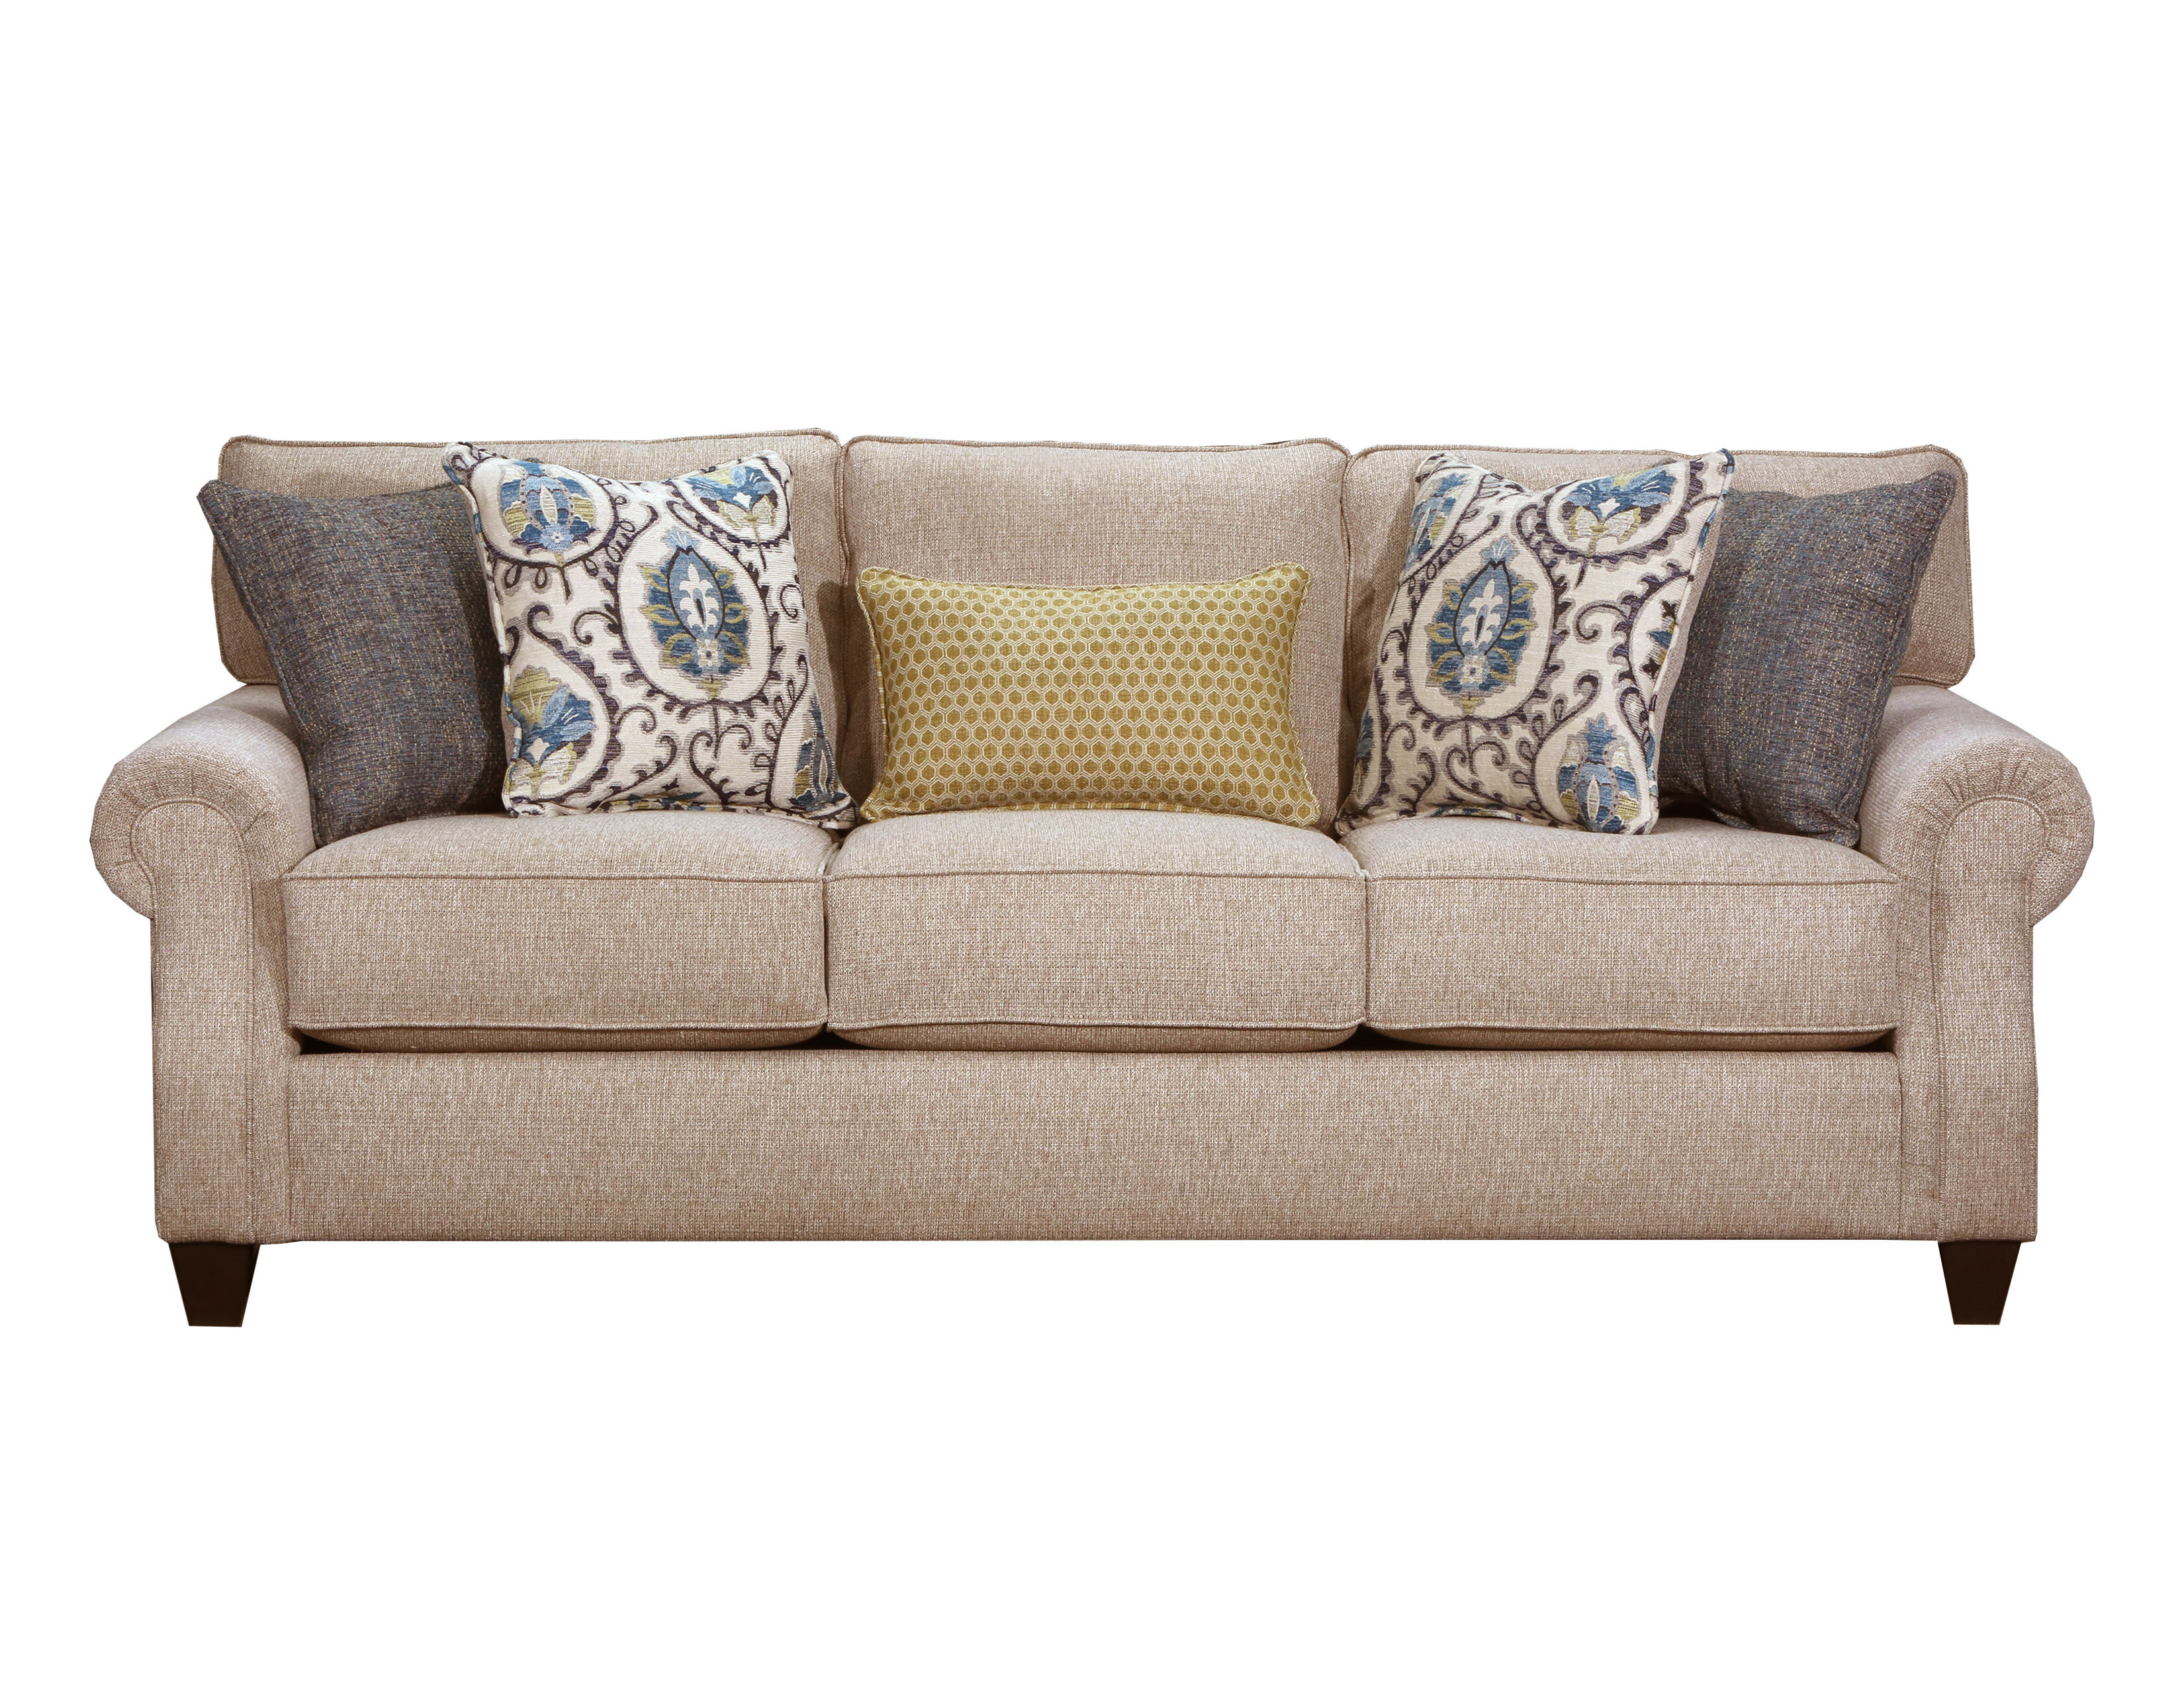 Surprising Dannie Sofa Bed Sleeper Inzonedesignstudio Interior Chair Design Inzonedesignstudiocom